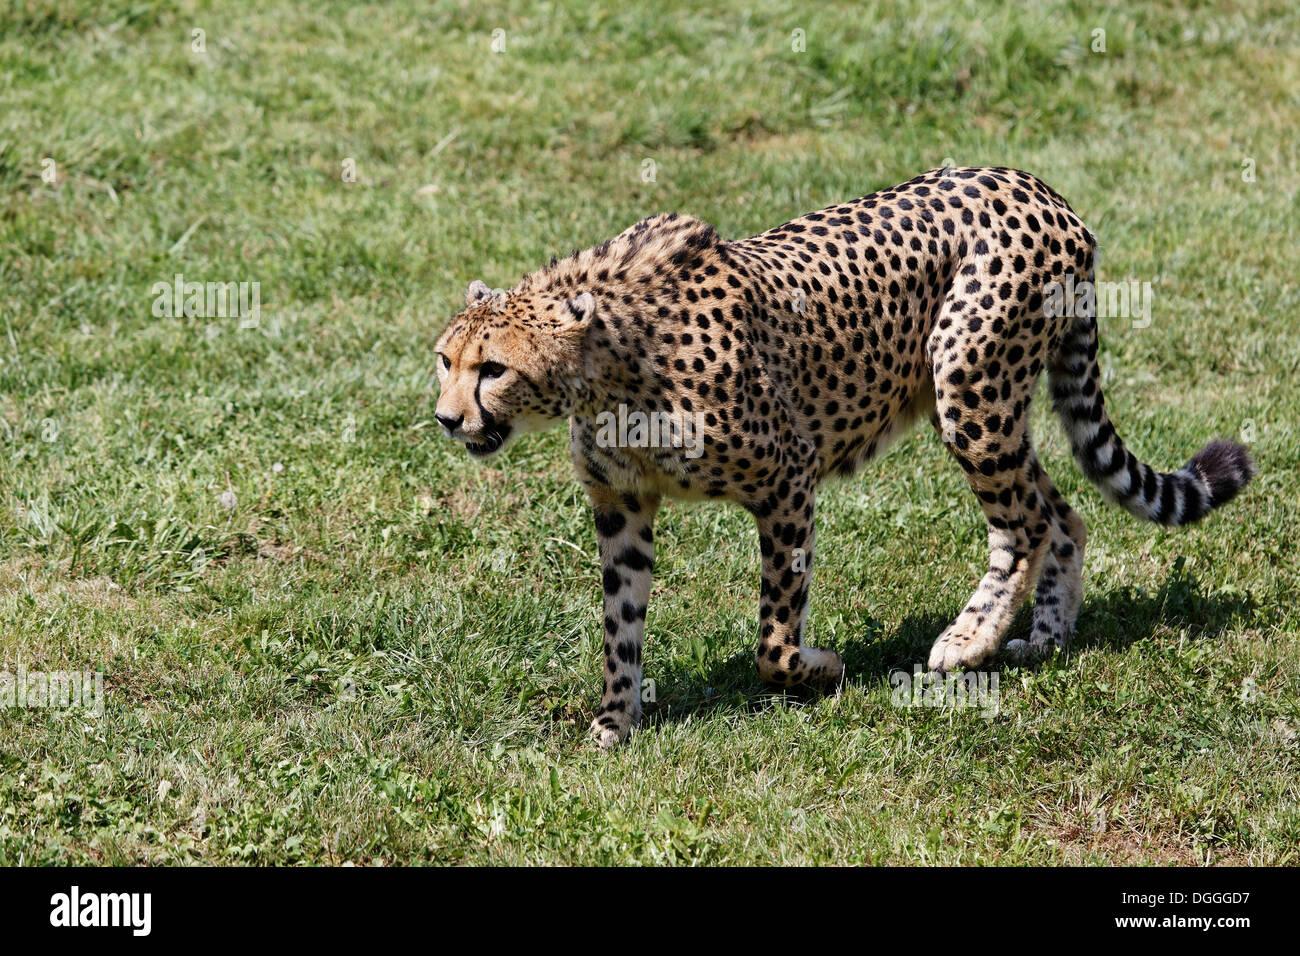 Gepard (Acinonyx Jubatus), Tierwelt Herberstein, World of Animals, Buchberg bei Herberstein, Stubenberg, Hartberg, Stockbild